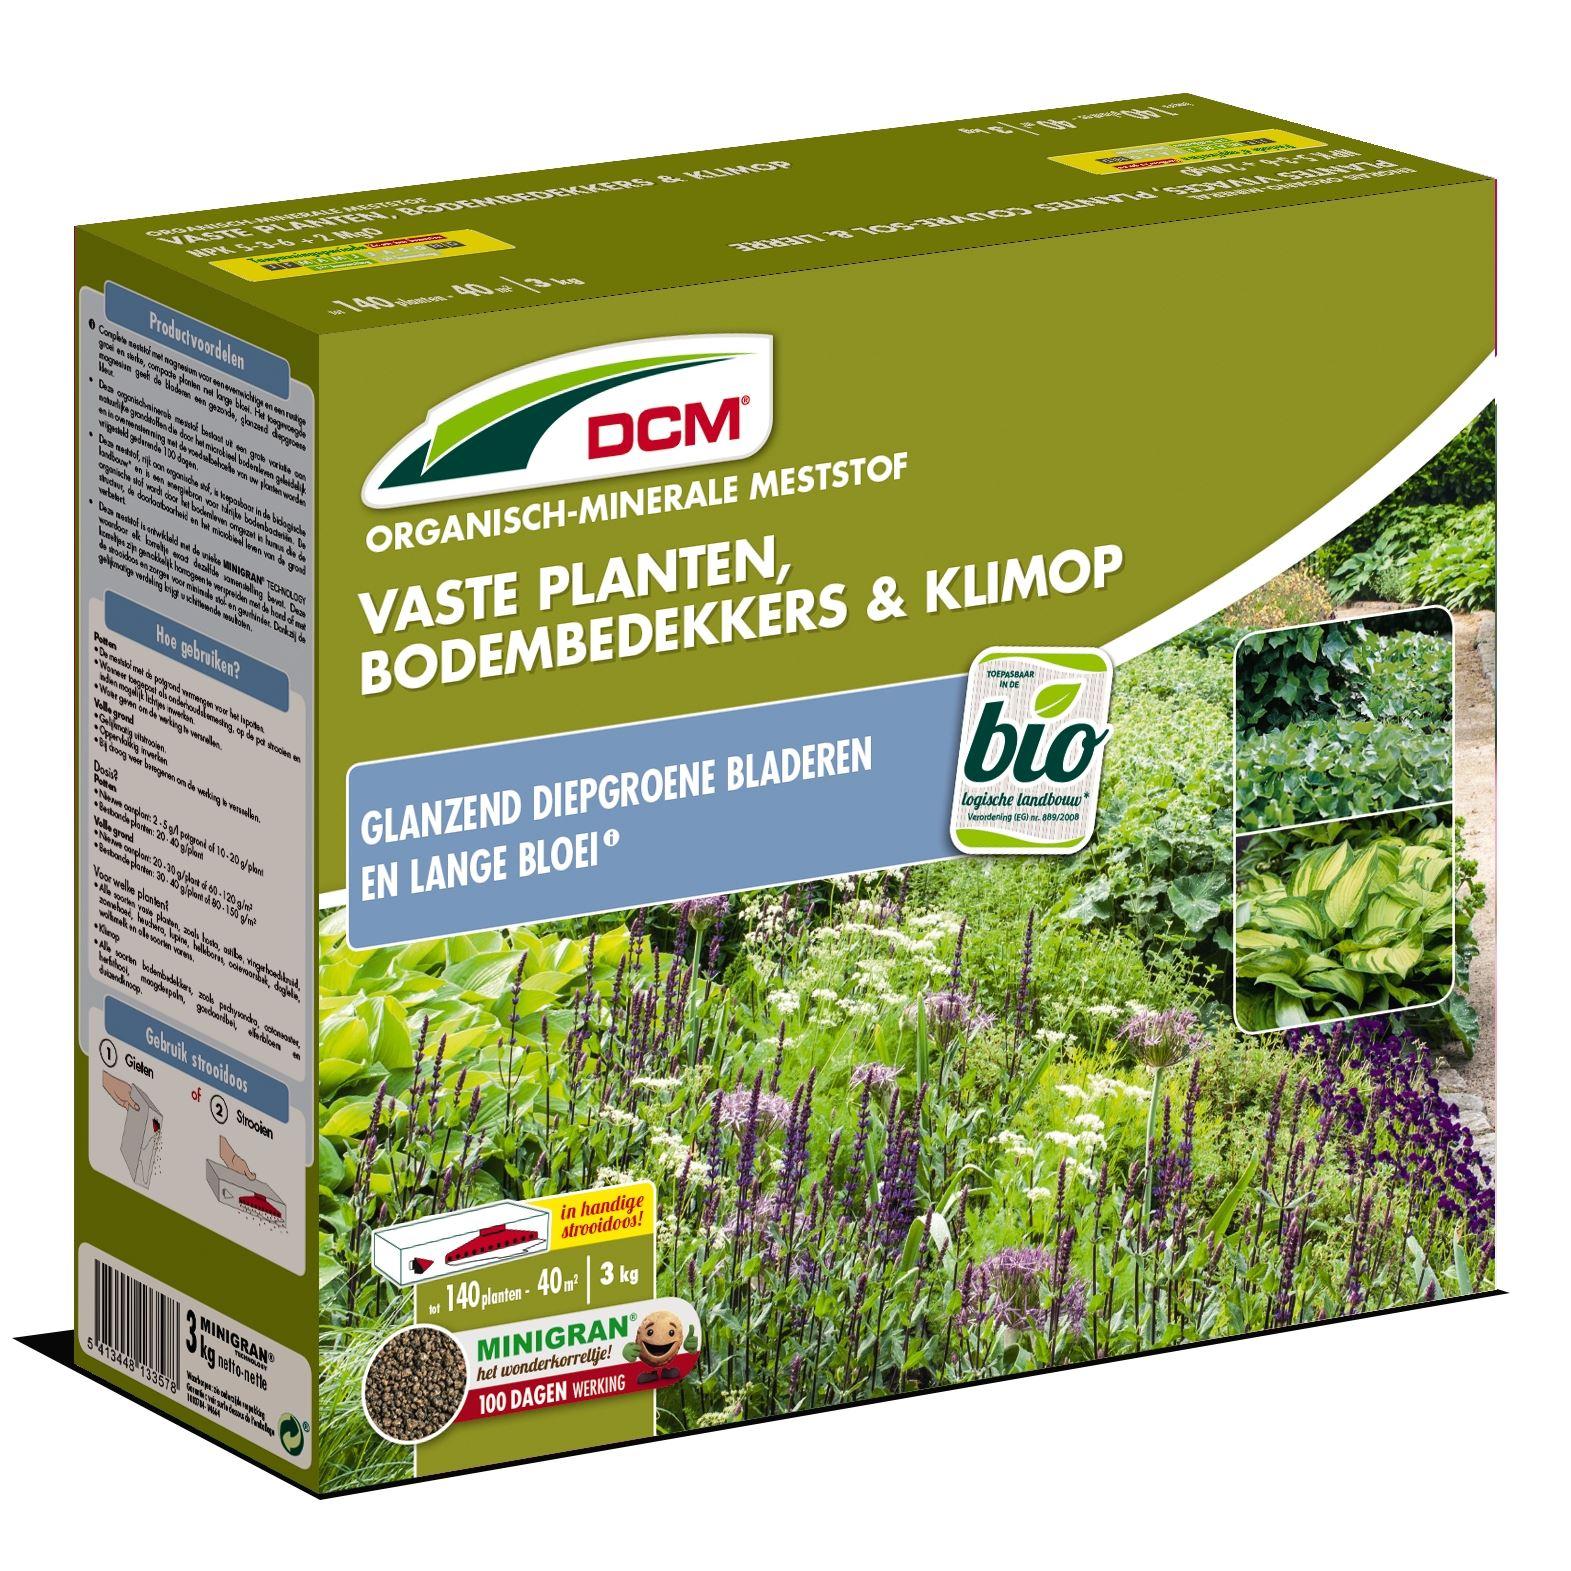 Meststof vaste planten, bodembedekkers & klimop 3kg - Bio